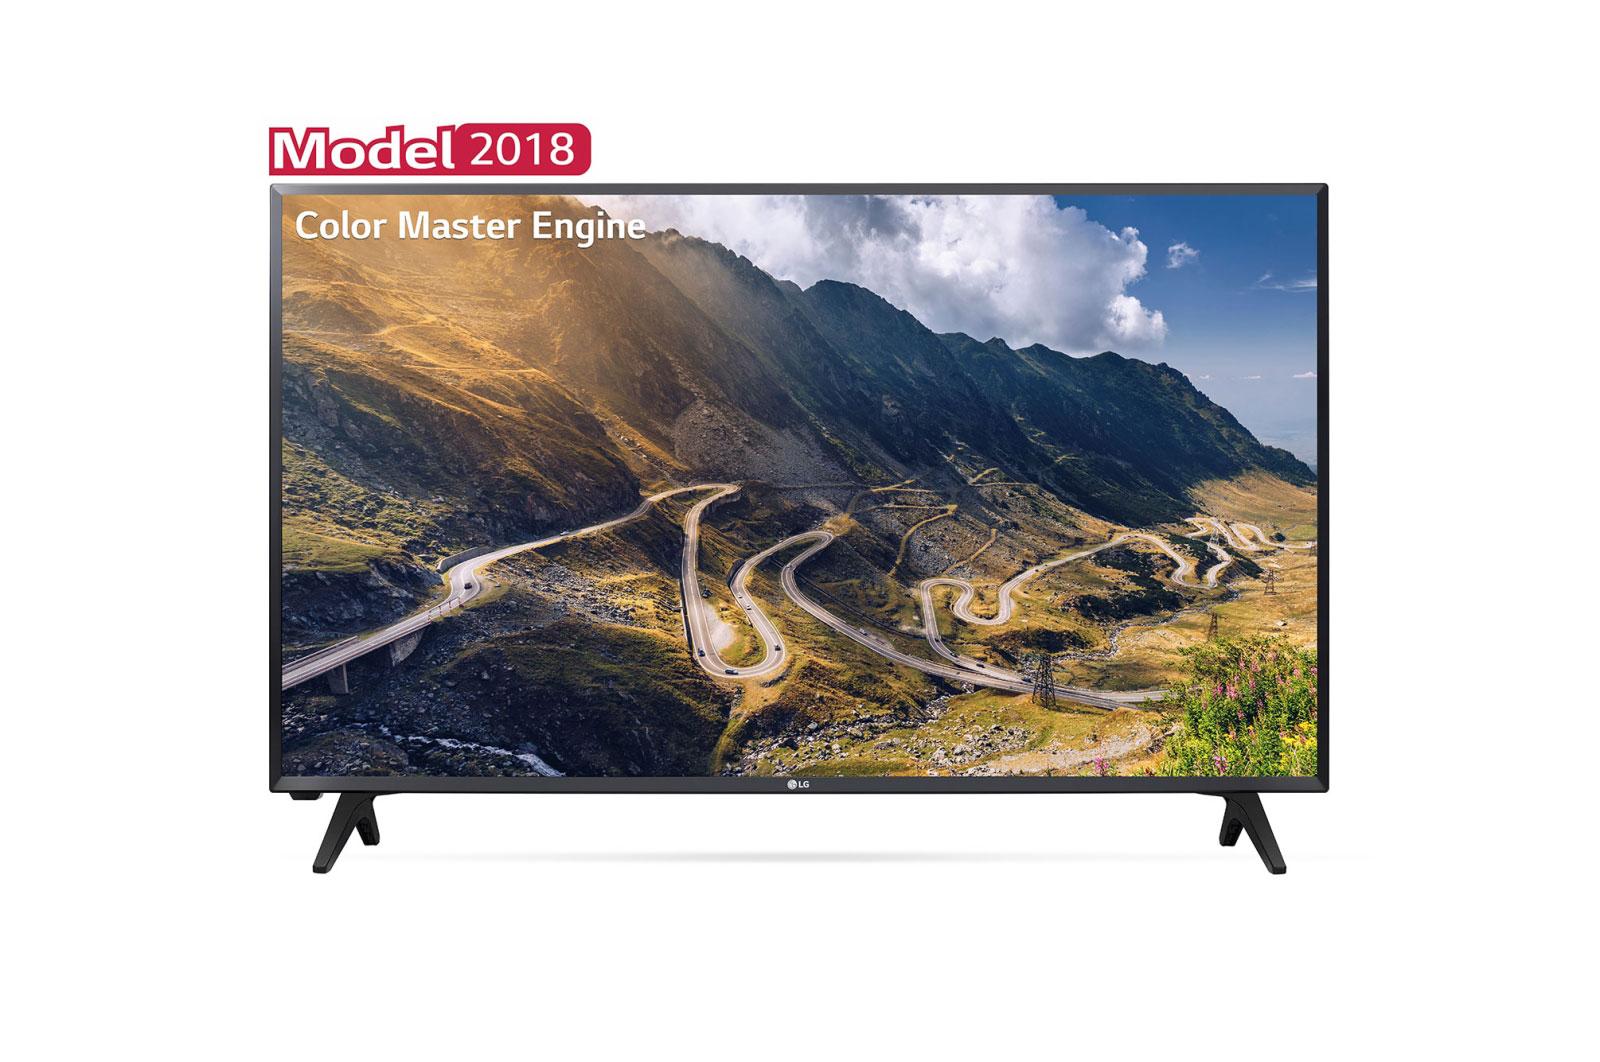 Televizor LED LG 32LK500BPLA 80cm HD Ready Negru